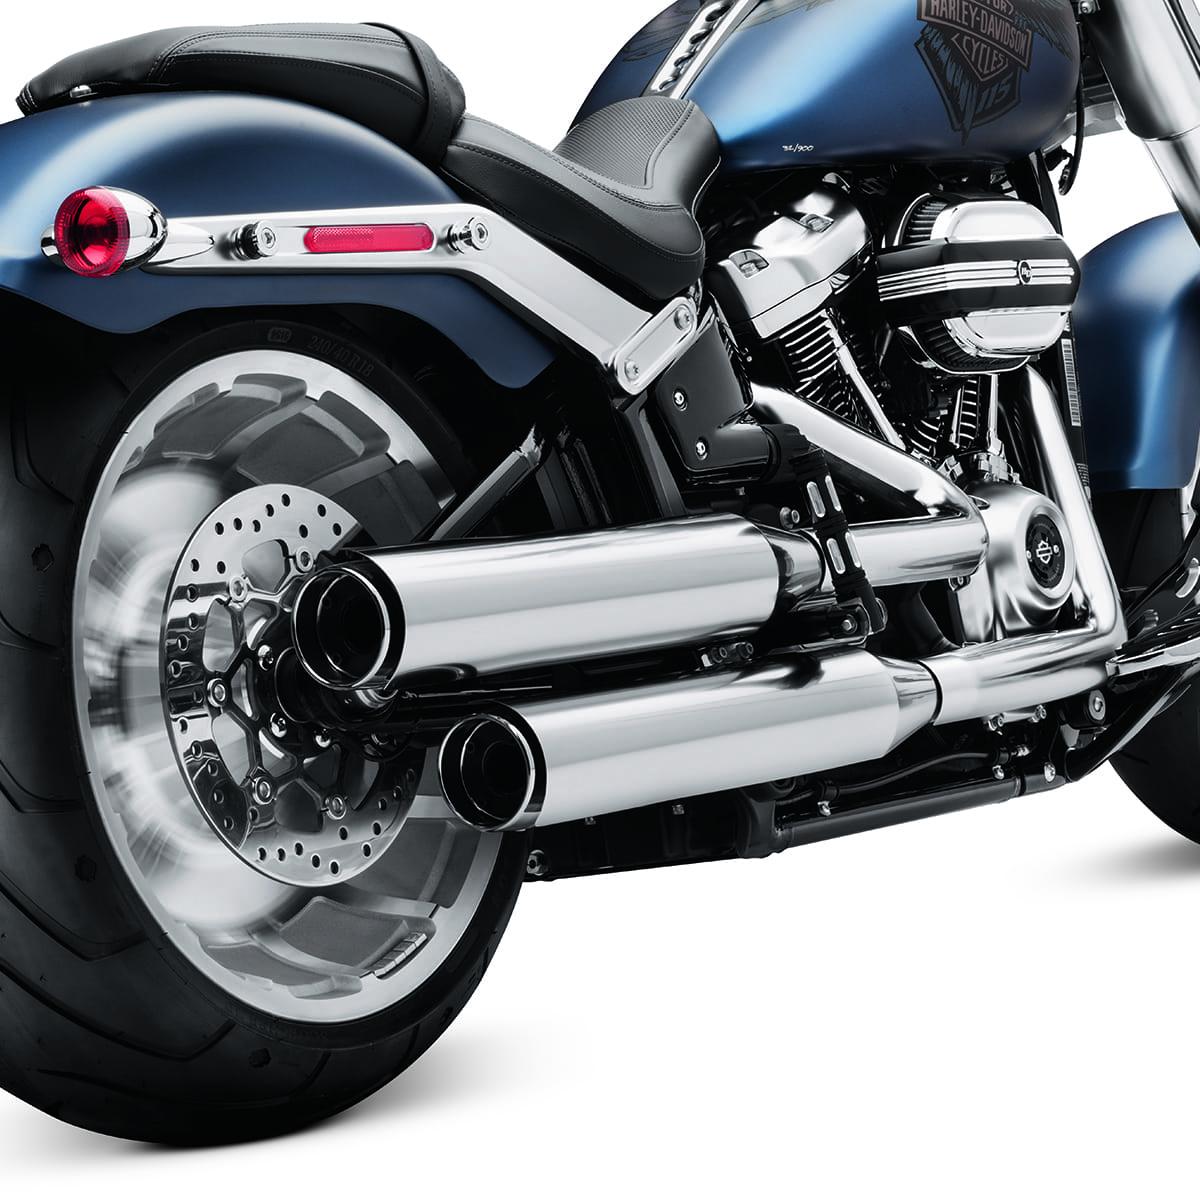 2018 Breakout | Harley-Davidson USA